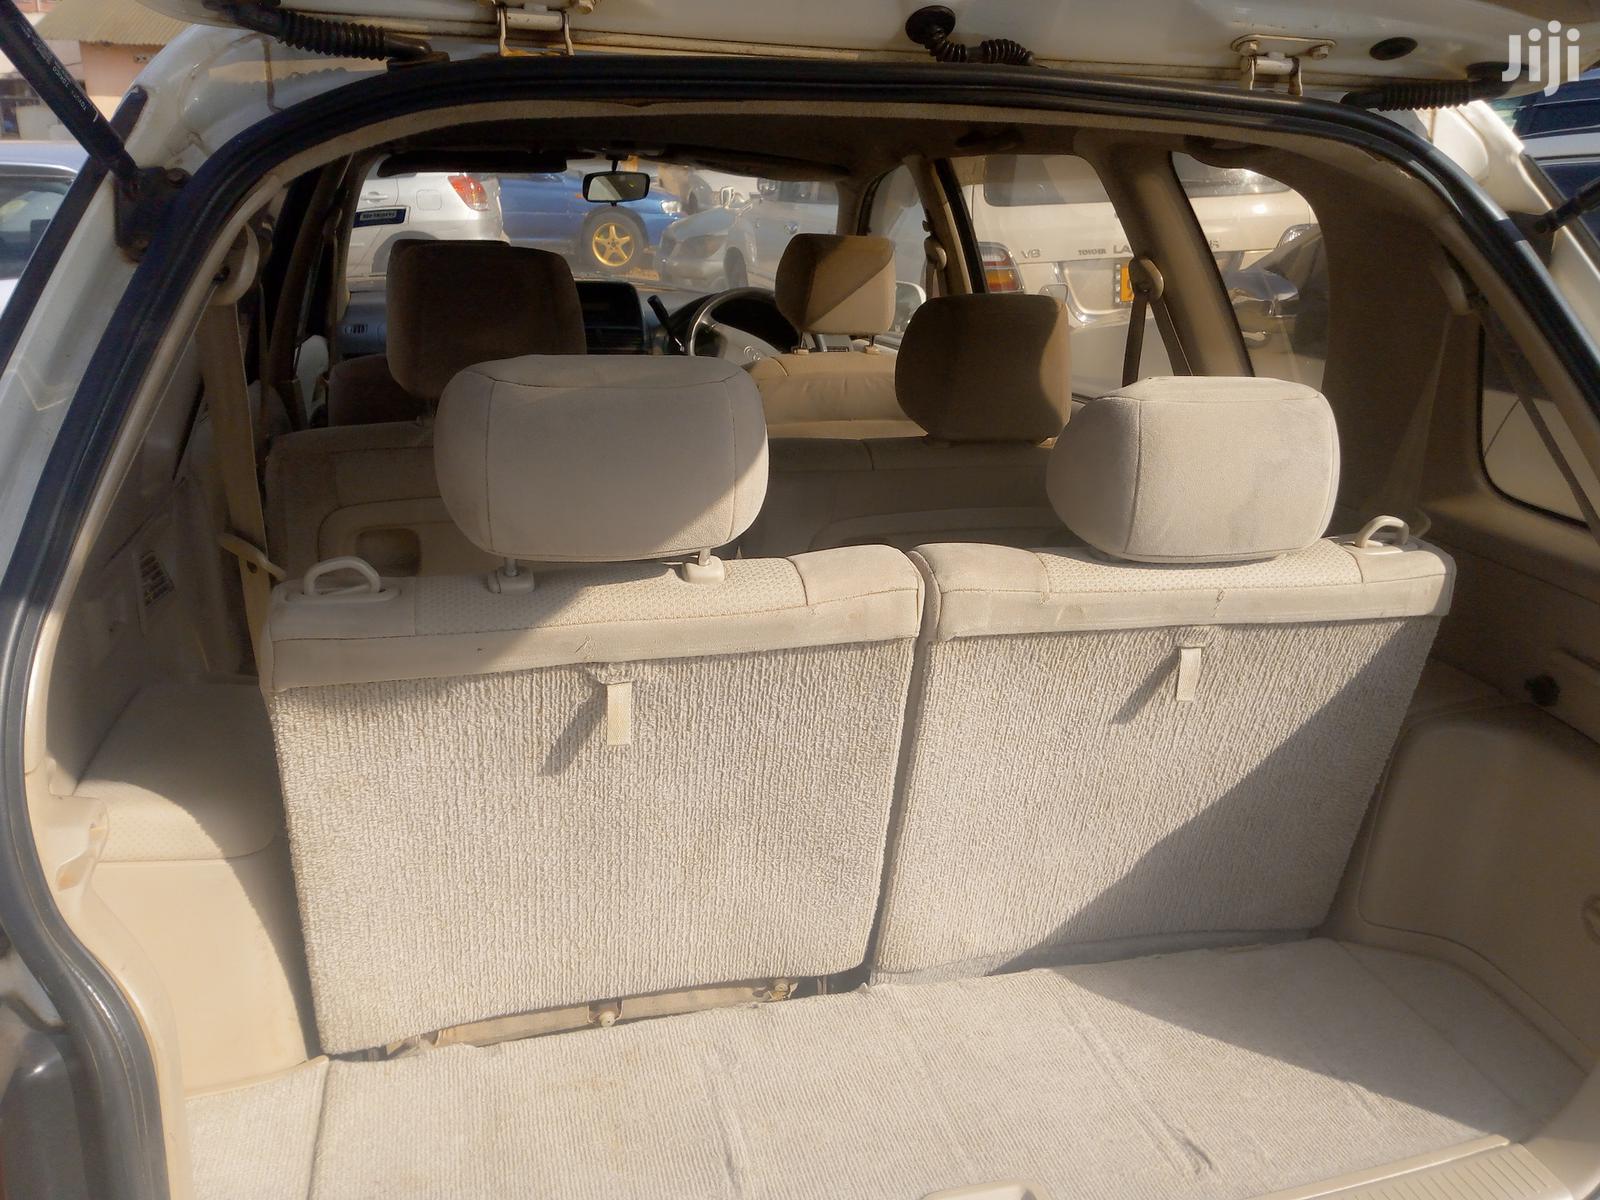 Toyota Ipsum 2000 White   Cars for sale in Kampala, Central Region, Uganda